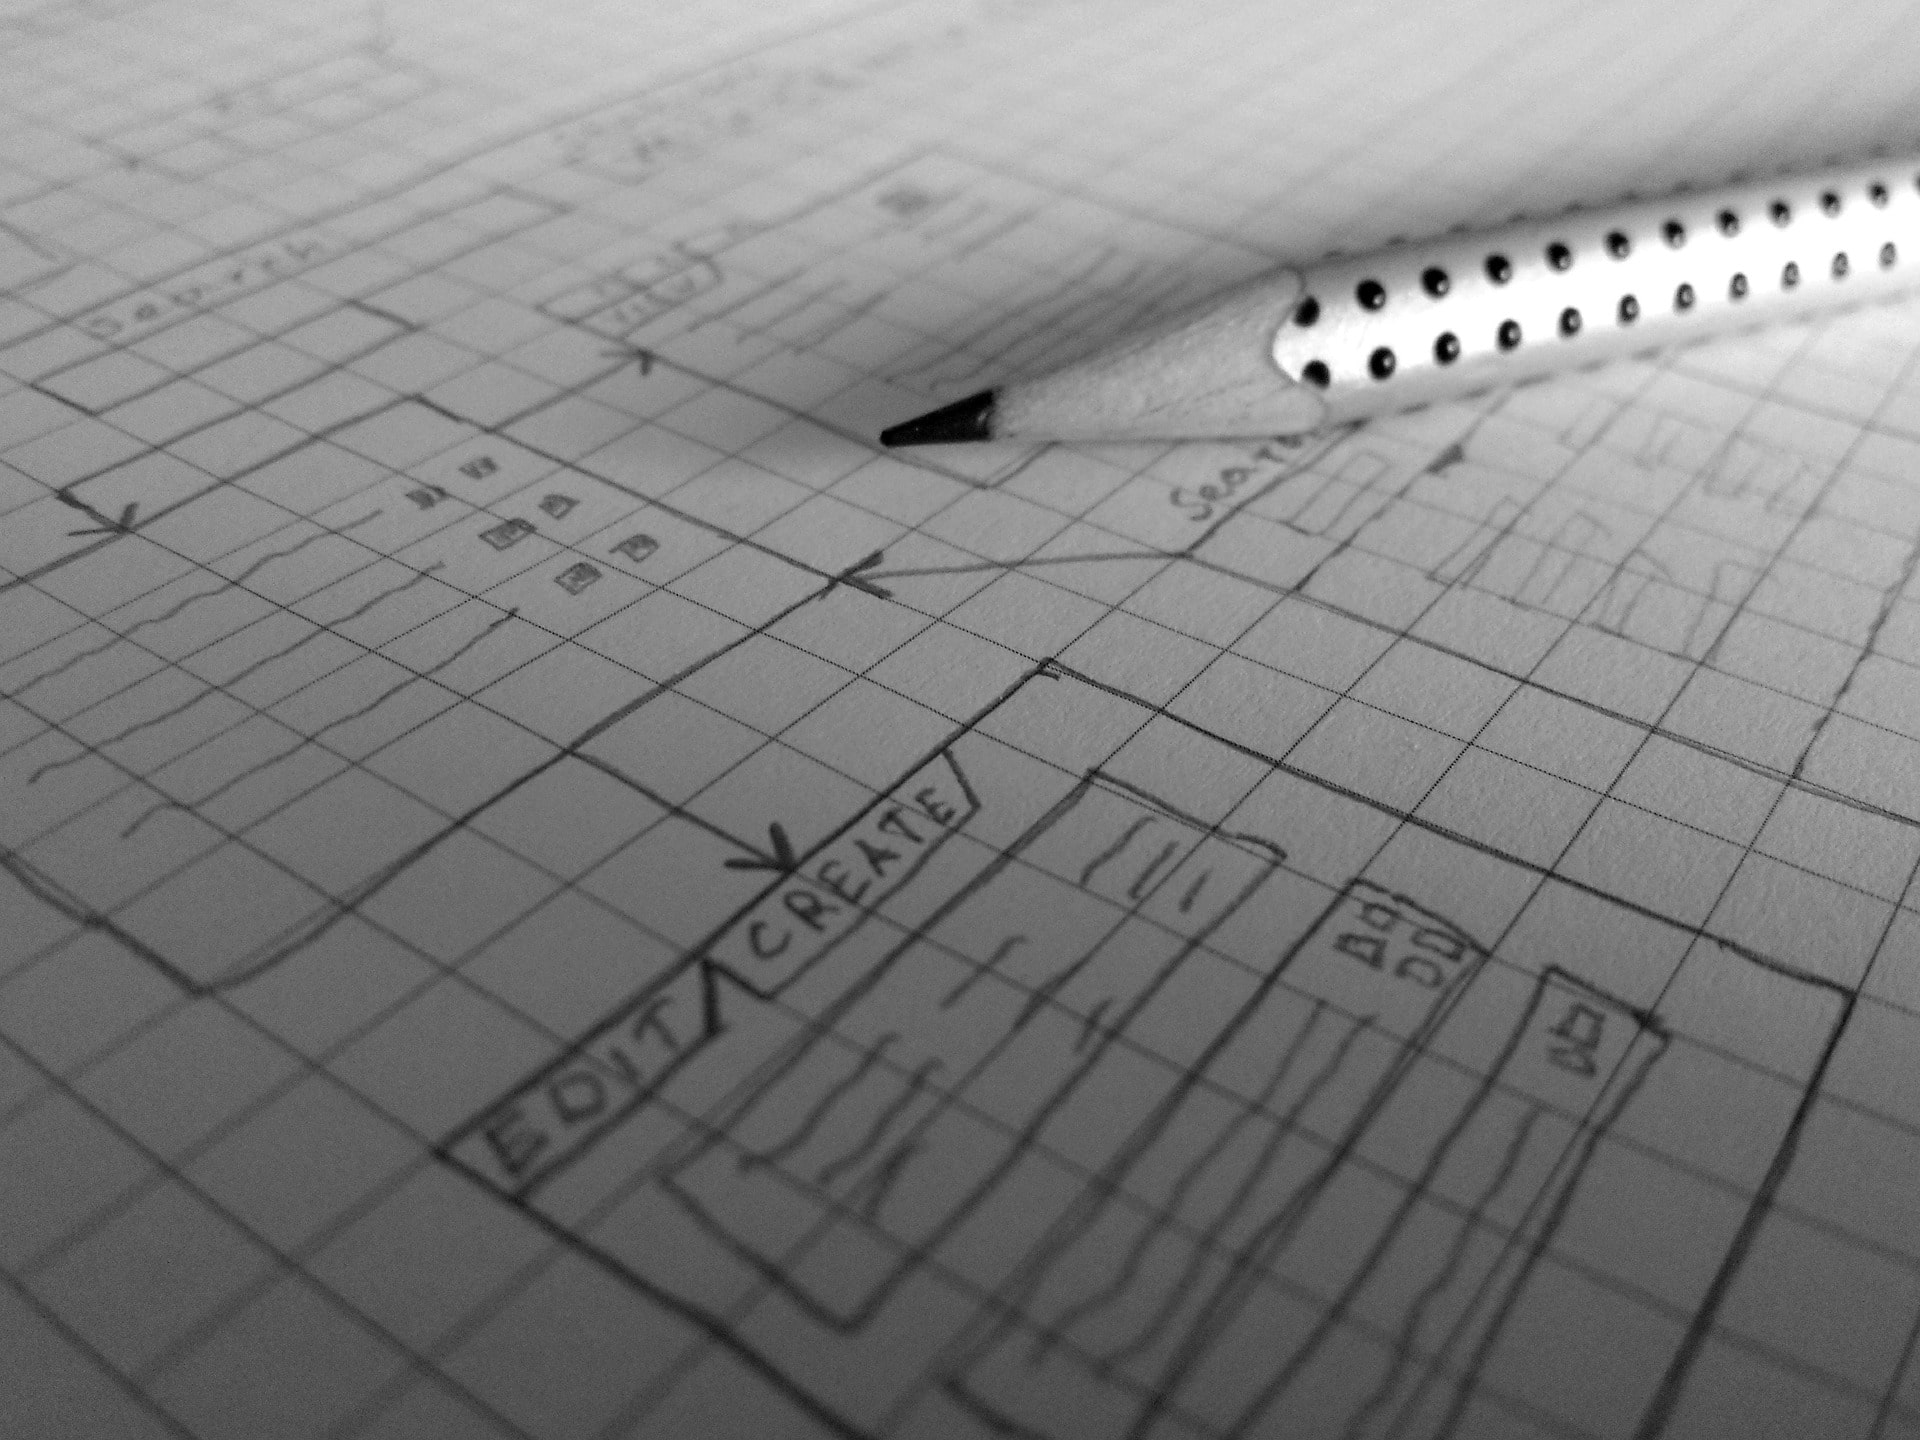 web builder, בניית אתרים